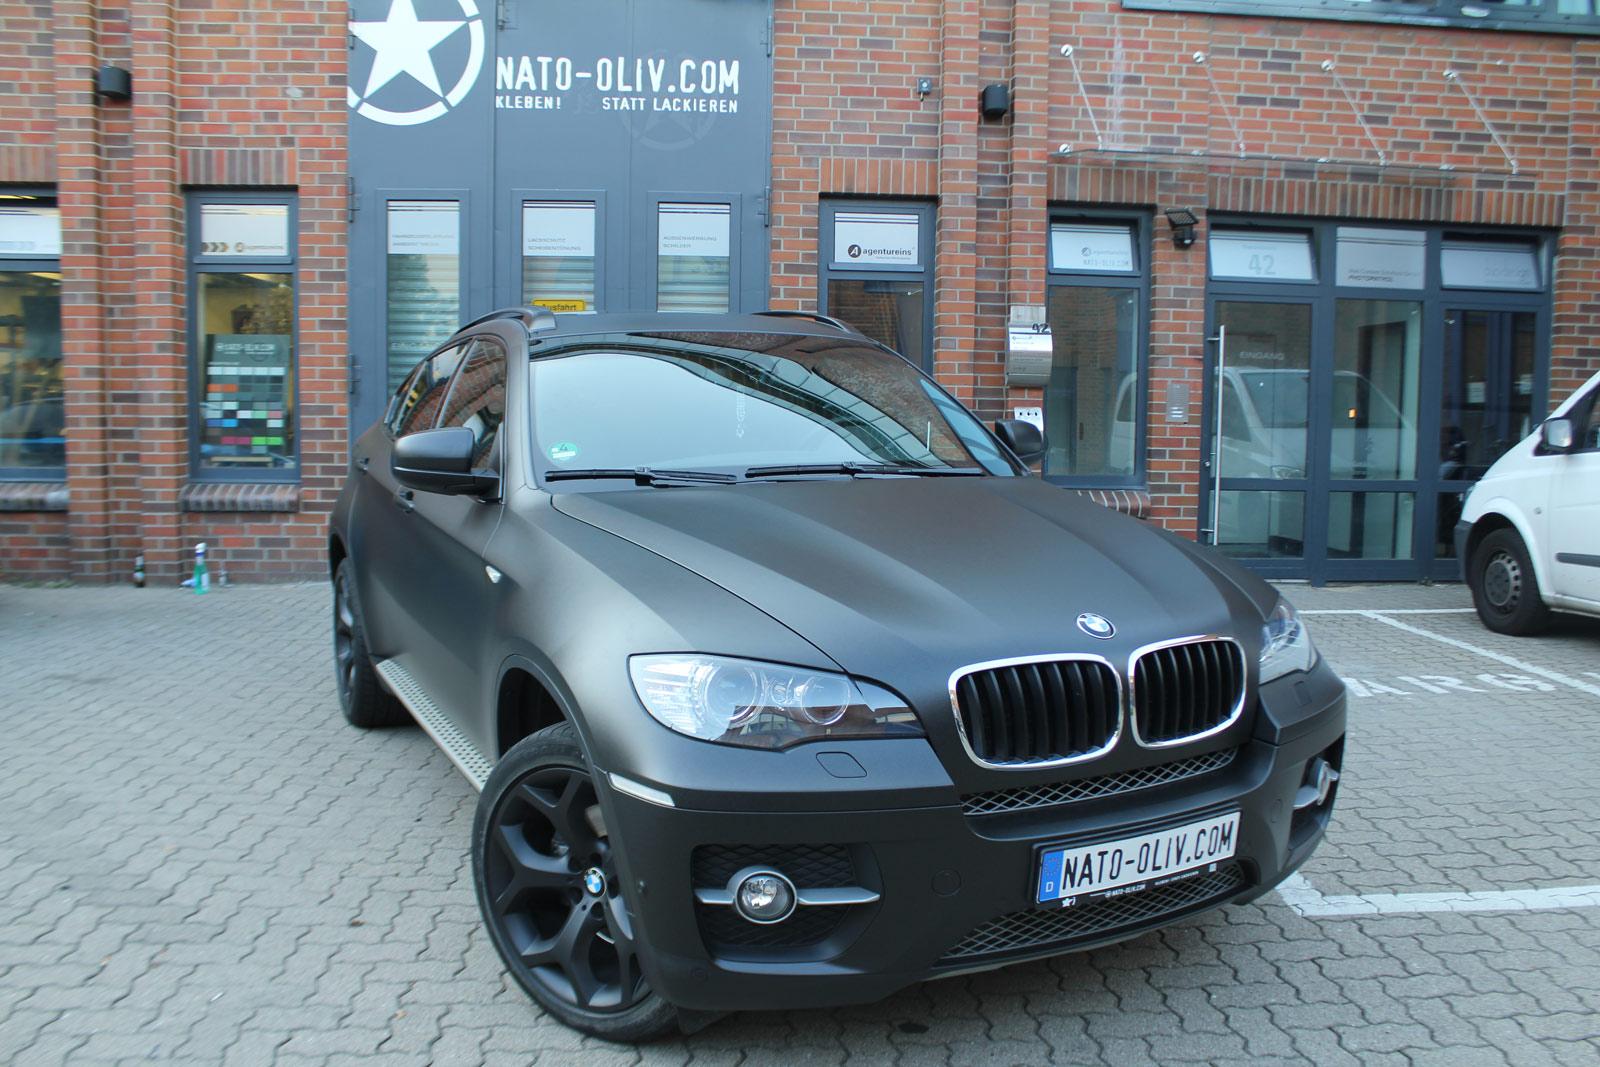 BMW_X6_FOLIERUNG_SCHWARZ_METALLIC_MATT_16